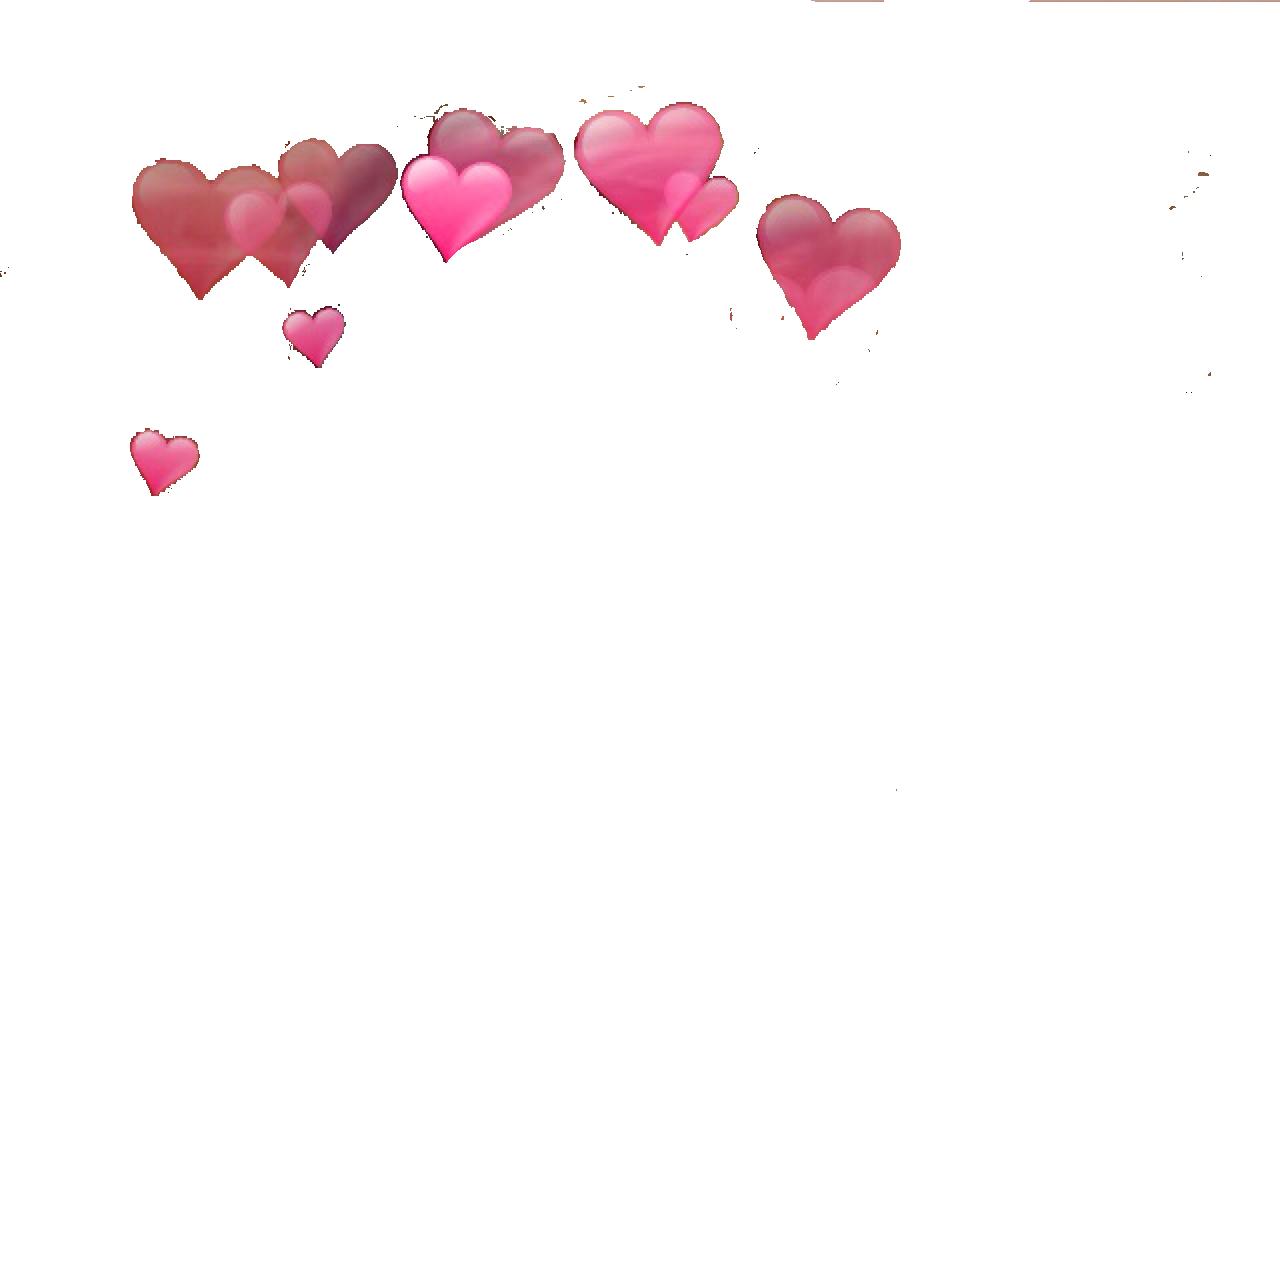 Macbook hearts png.  sos edits everyone